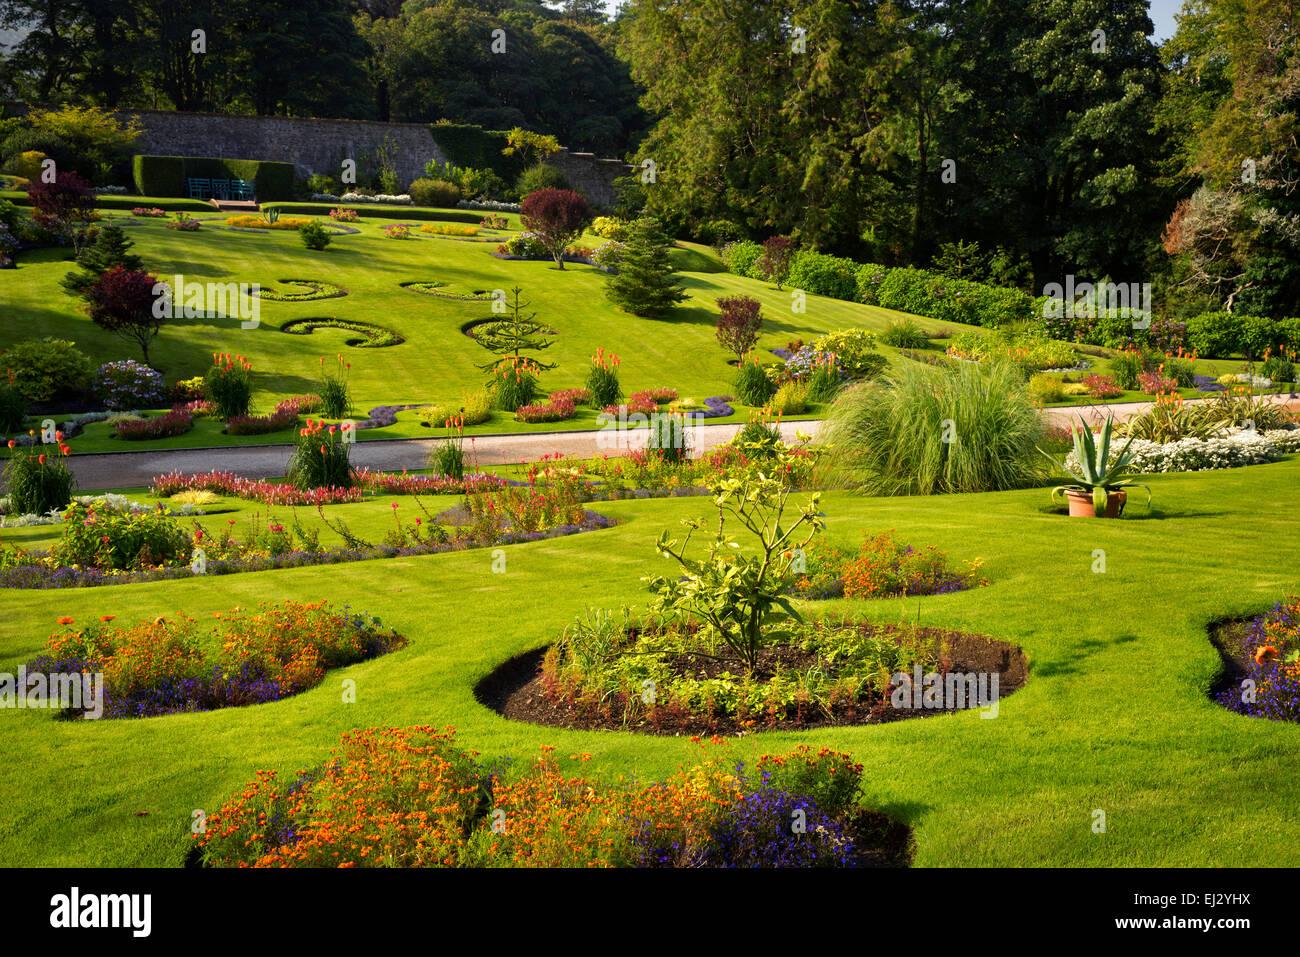 Walled Garden at Kylemore Abbey. Connemara region, ireland - Stock Image